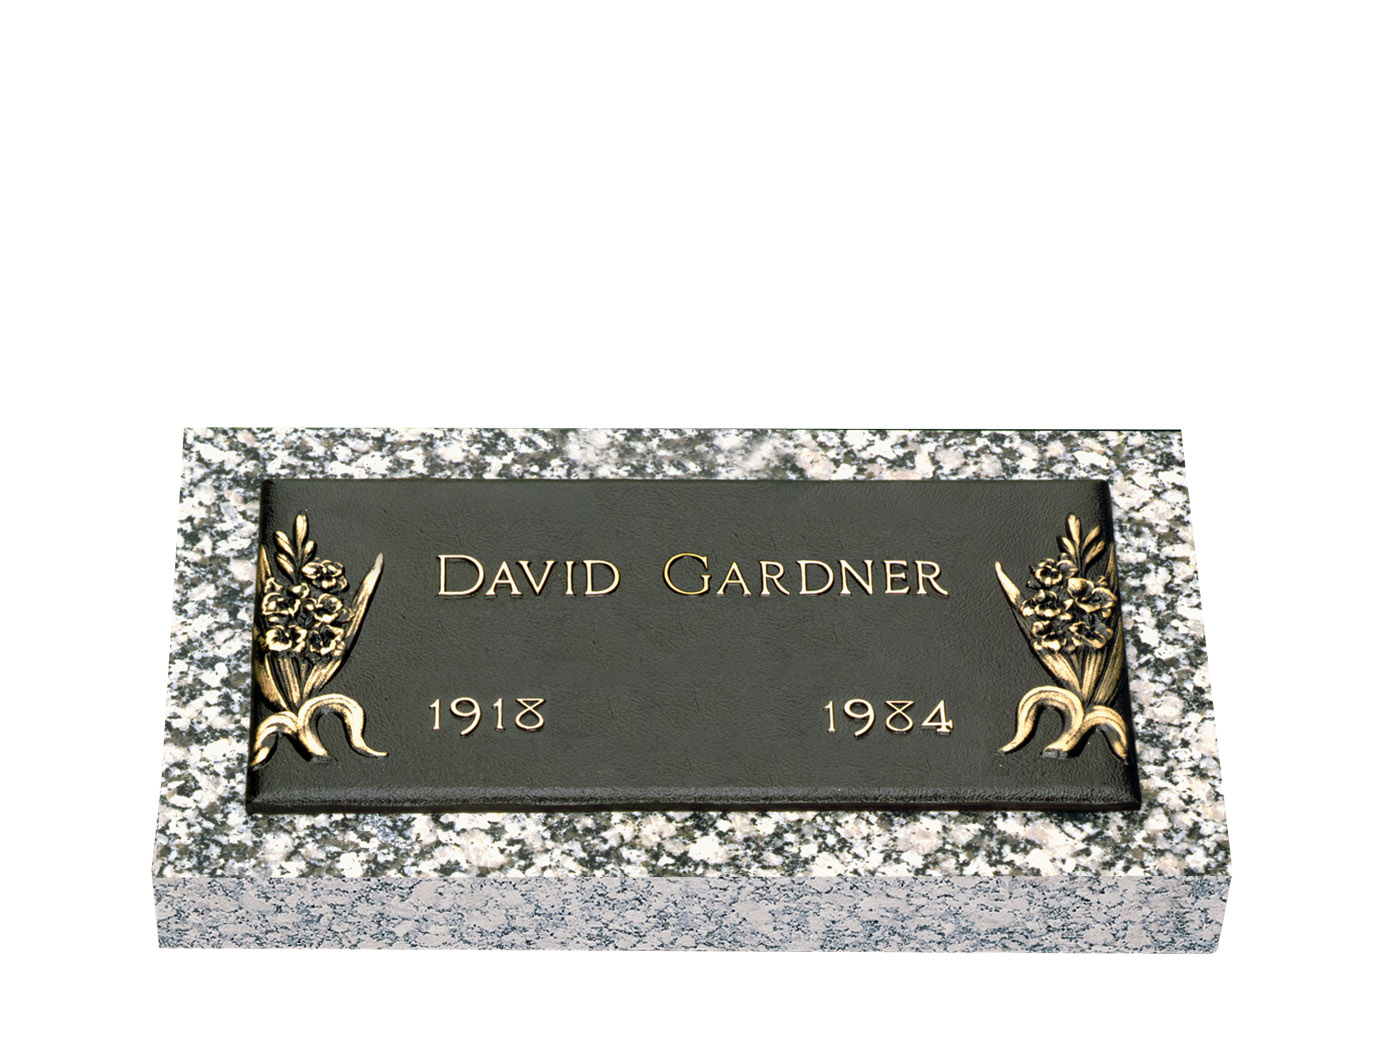 Gladiola bronze cemetery grave marker lovemarkers infant bronze head stone reviewsmspy